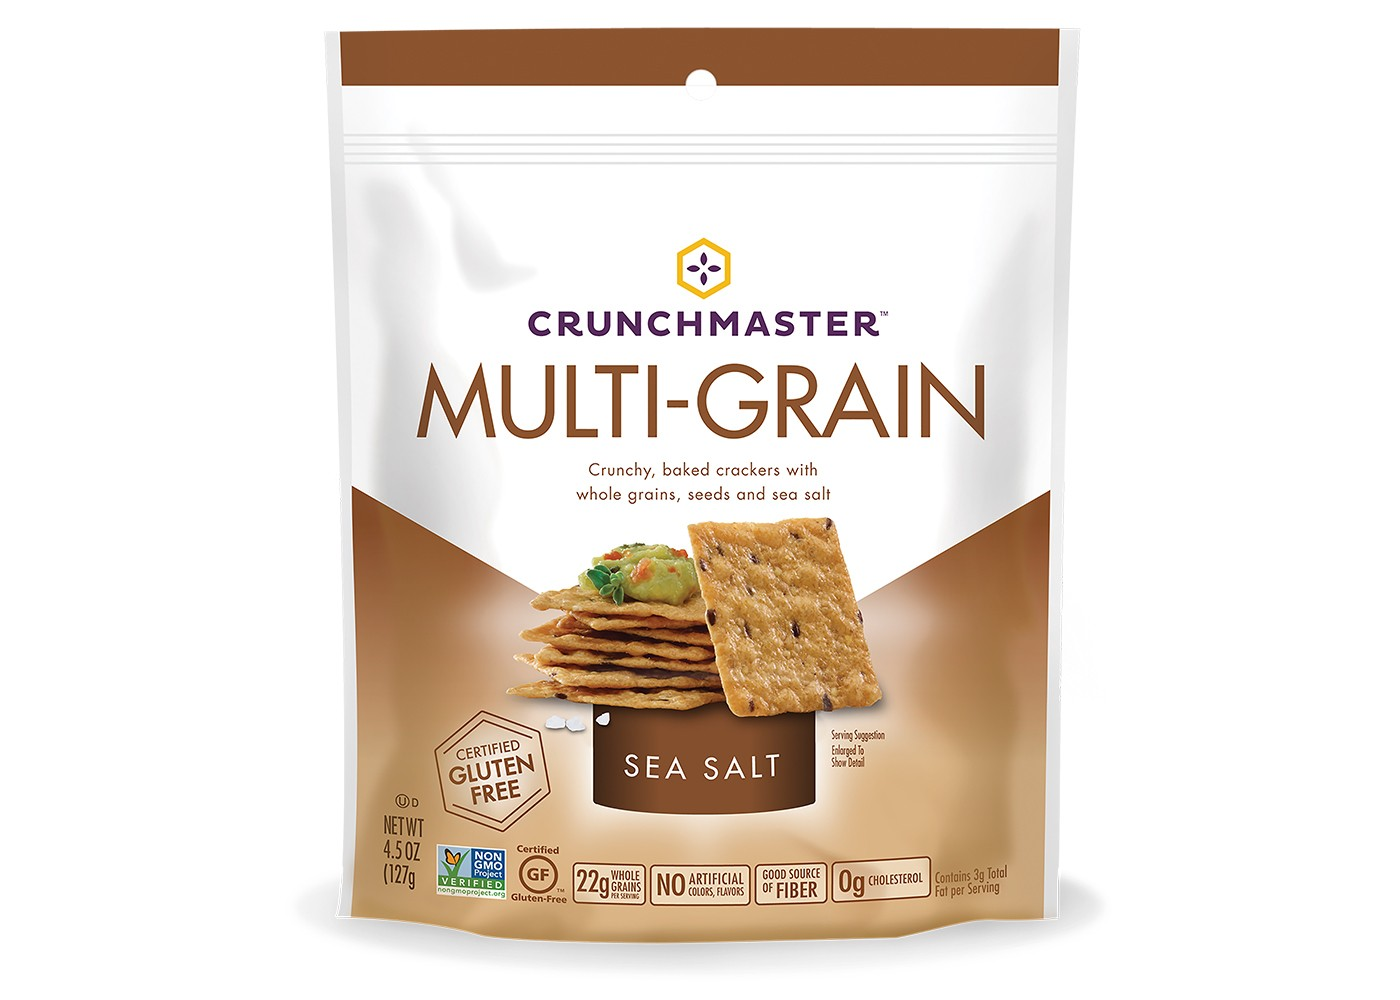 Crunchmaster Multi-Grain Sea Salt Crackers 4.5oz - image 1 of 1